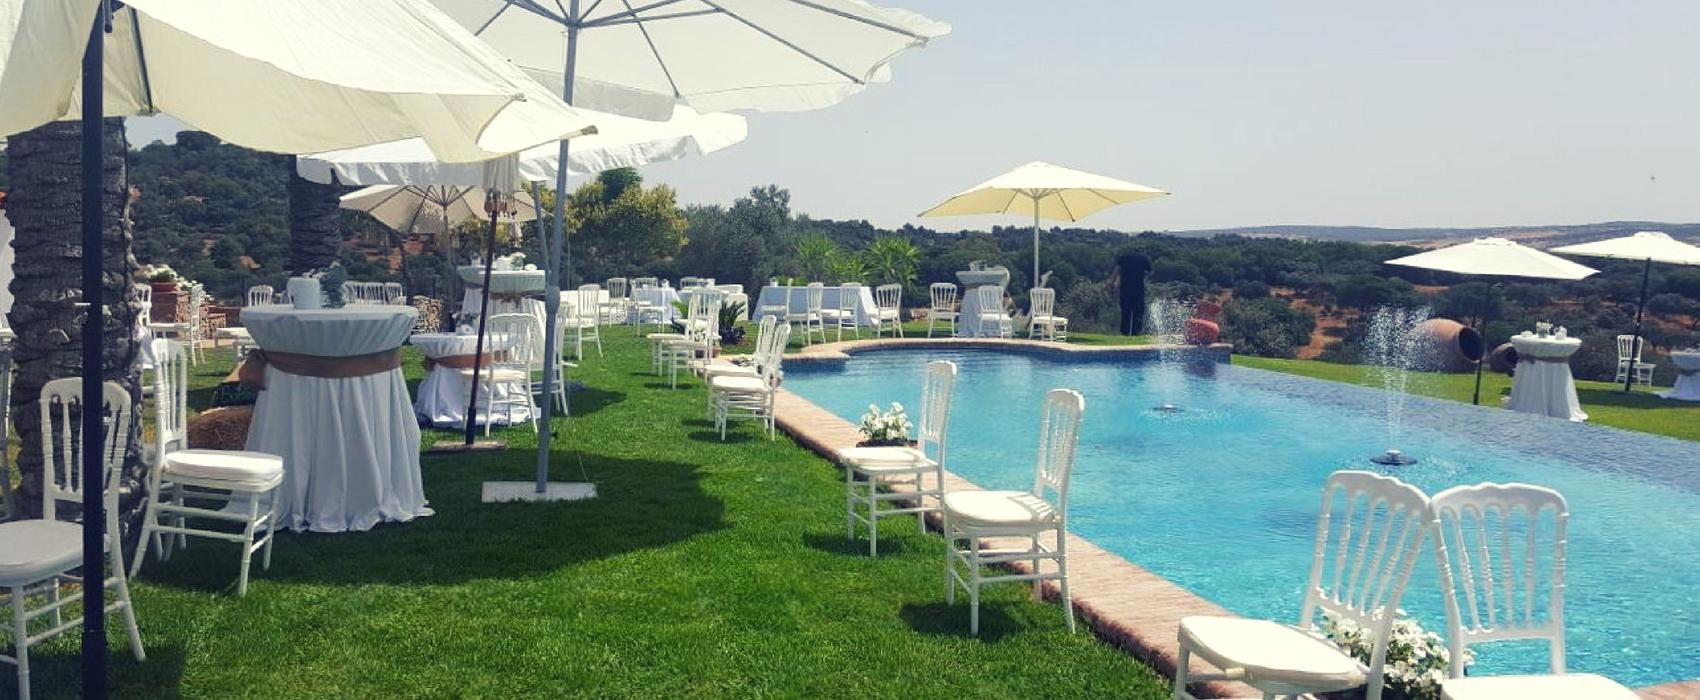 5 lugares para celebrar bodas en Extremadura